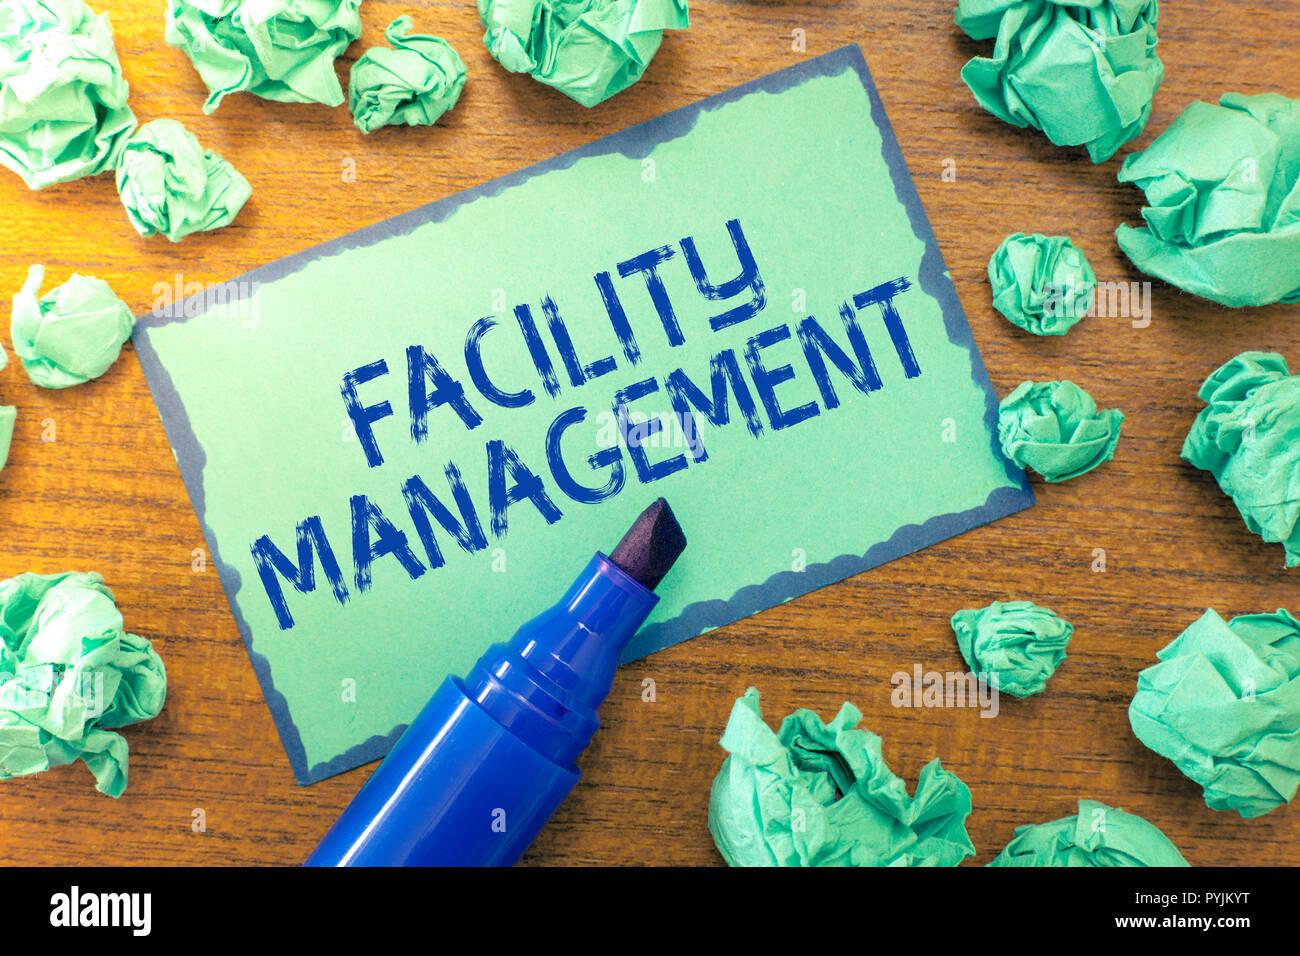 Handschrift text Facility Management. Begriff Sinne mehrere Funktion Disziplin Umwelt Wartung. Stockbild